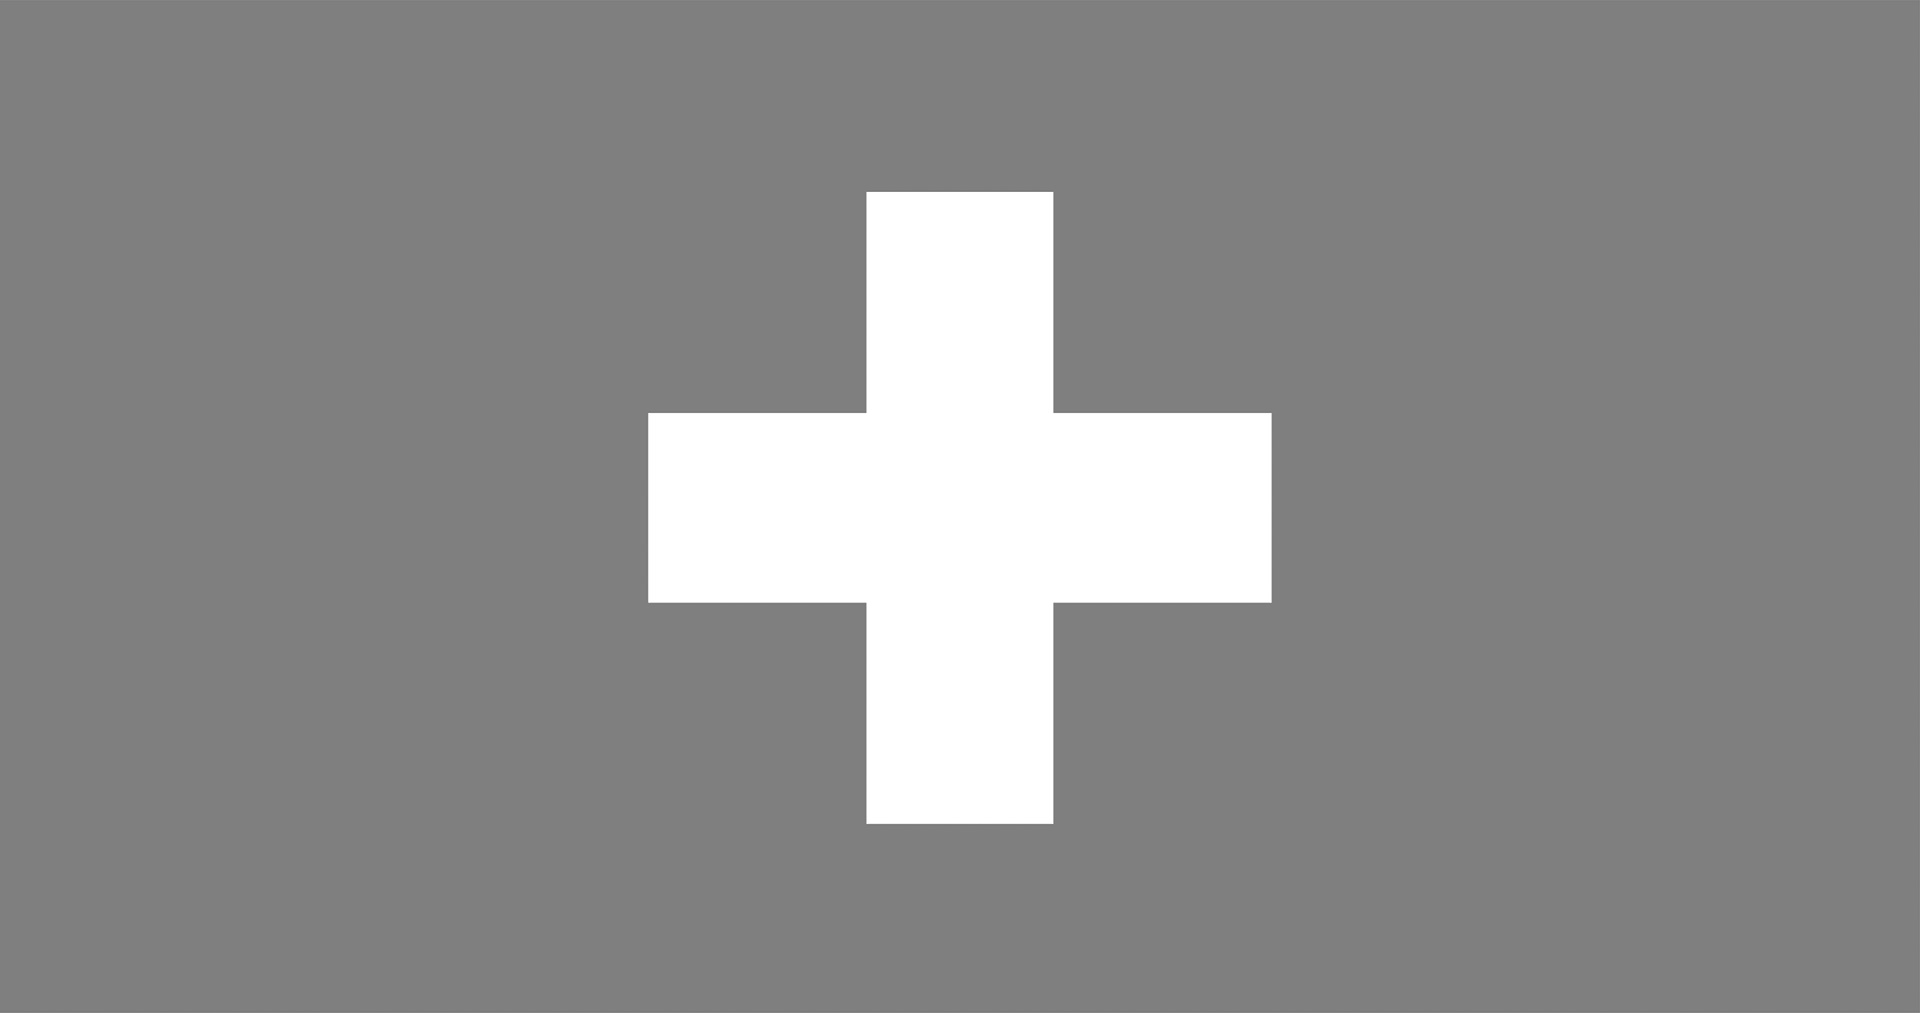 Schweiz DSGVO